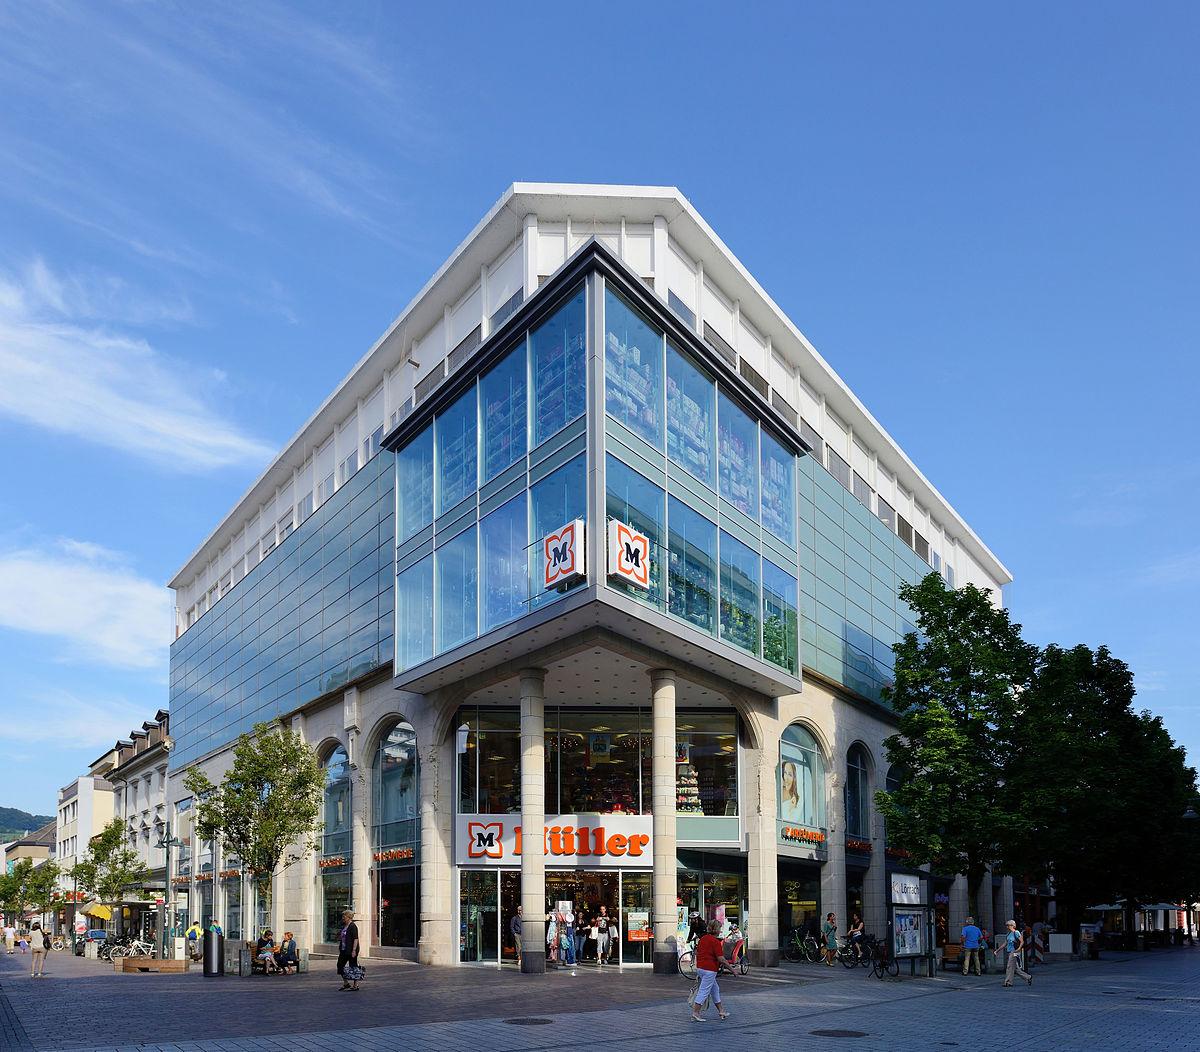 Müller Markt Regensburg